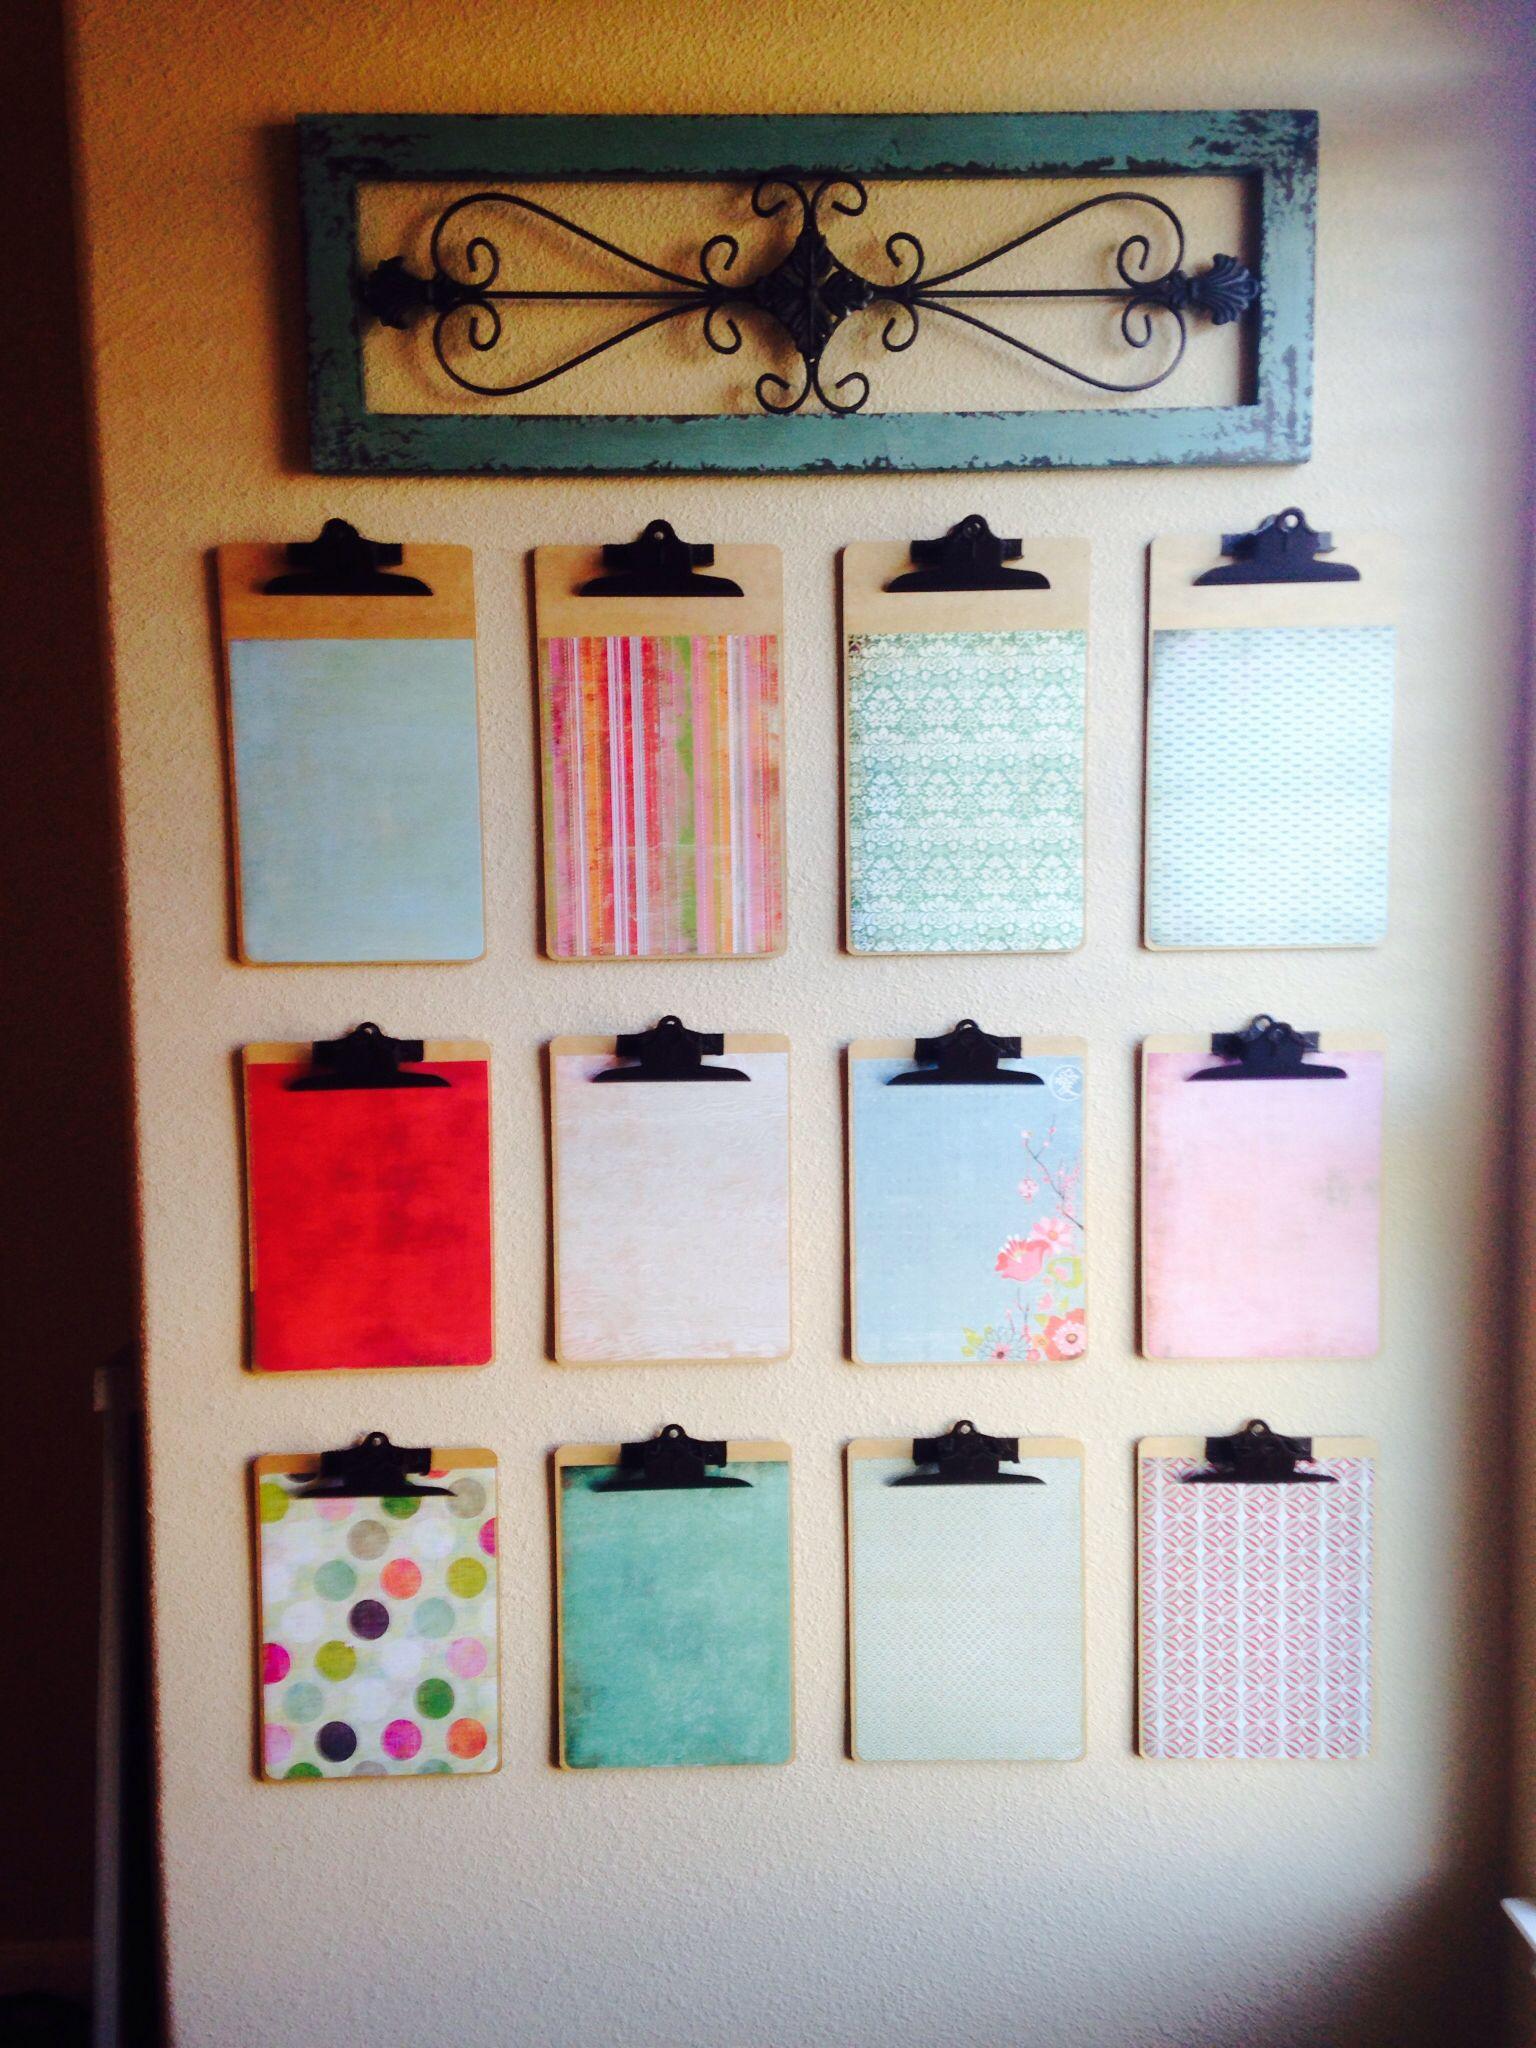 Scrapbook paper display - Scrapbook Paper On Clipboards For The Children S Artwork Or School Work Display Great Game Room